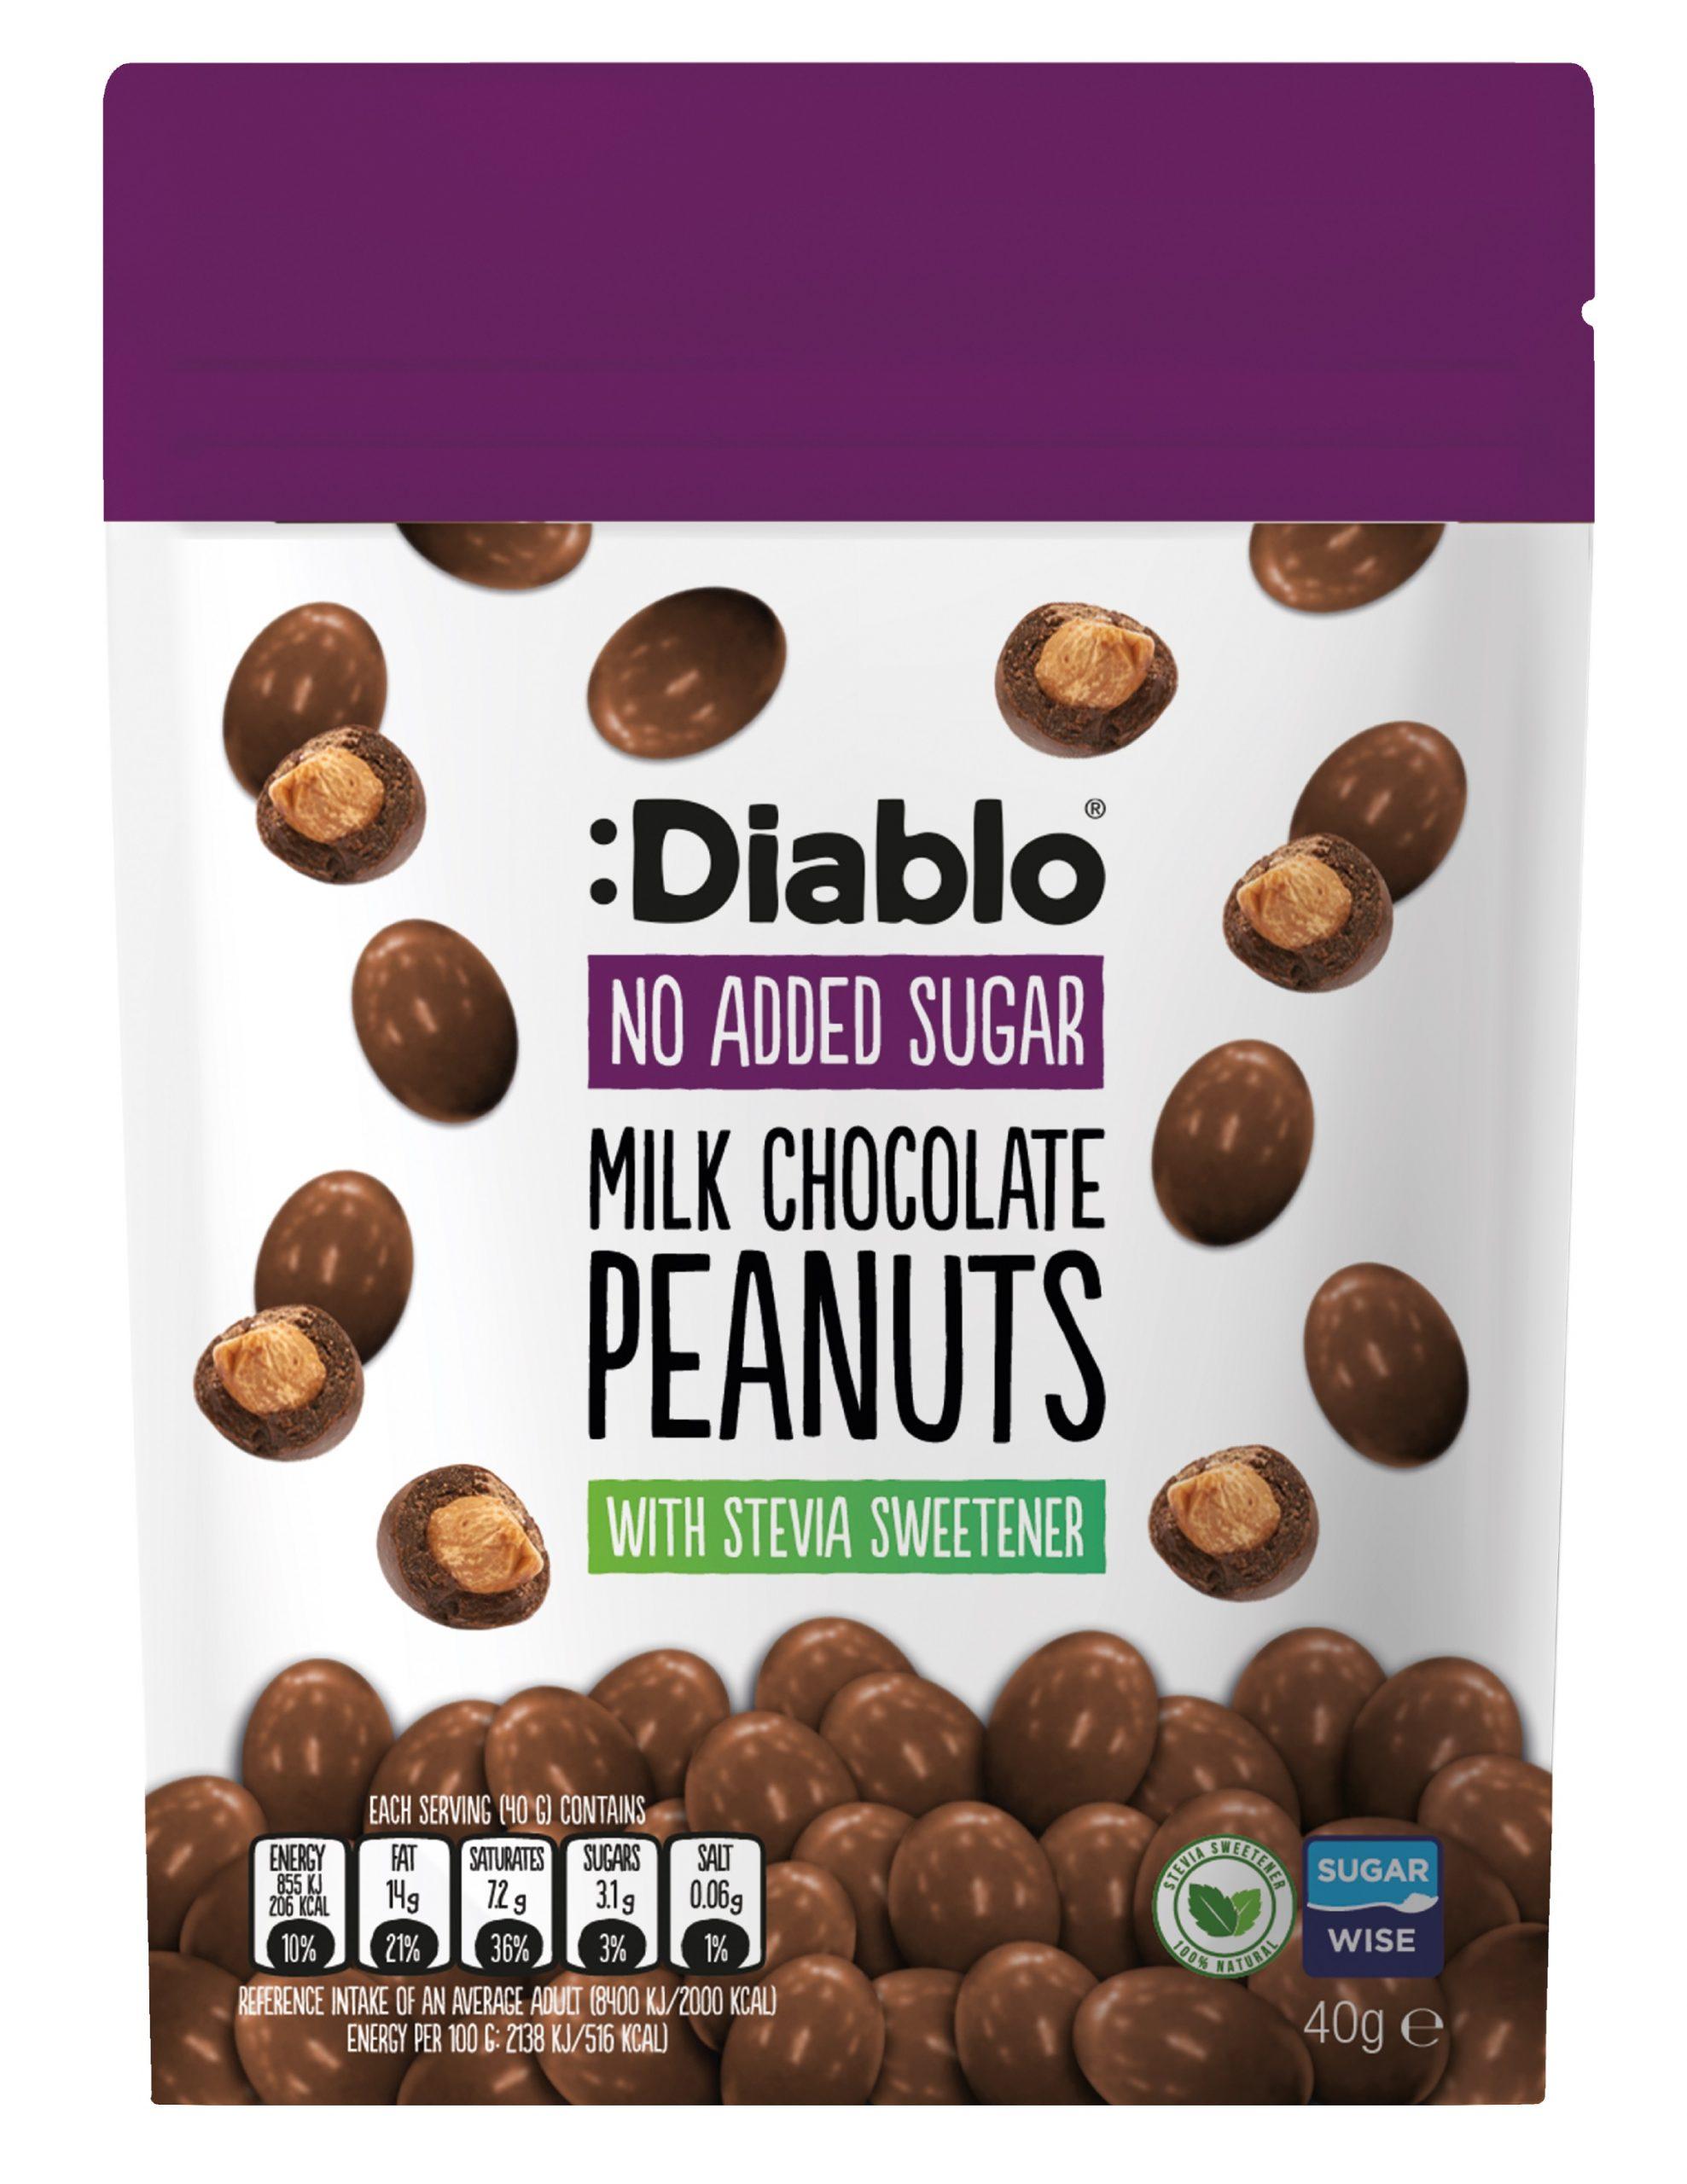 Diablo NAS Milk Choc Peanuts